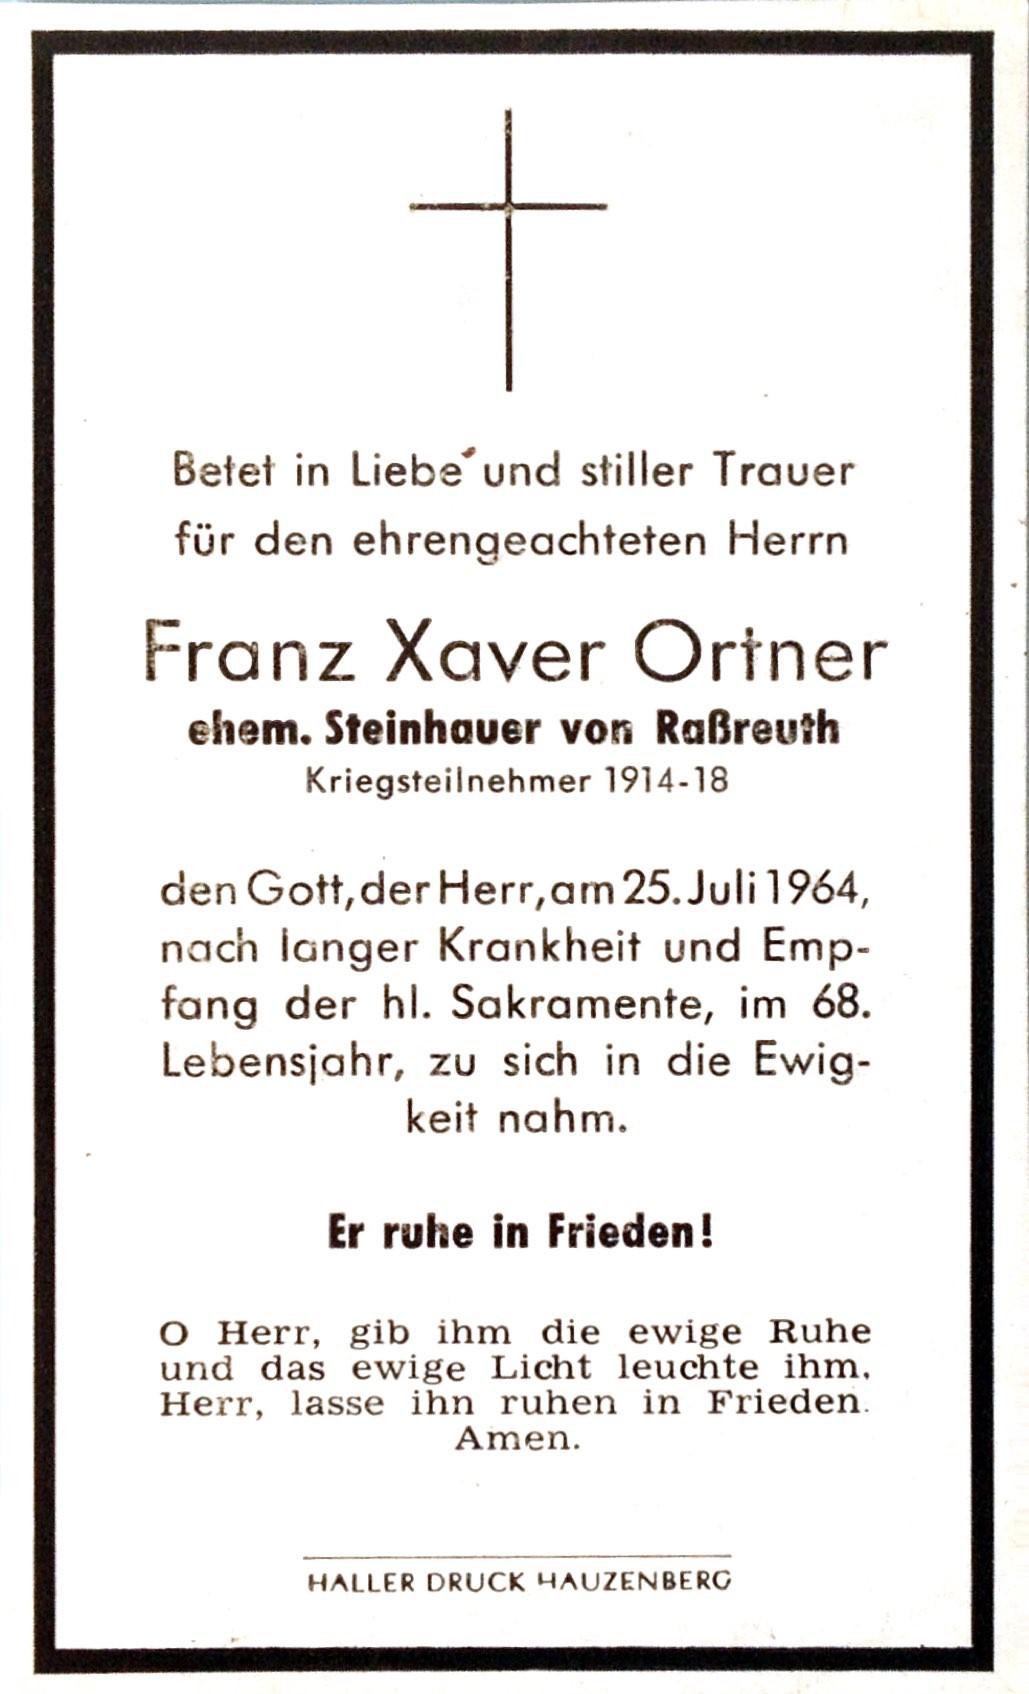 1964-07-25-Ortner-Franz-Xaver-Raßreuth-Steinhauer